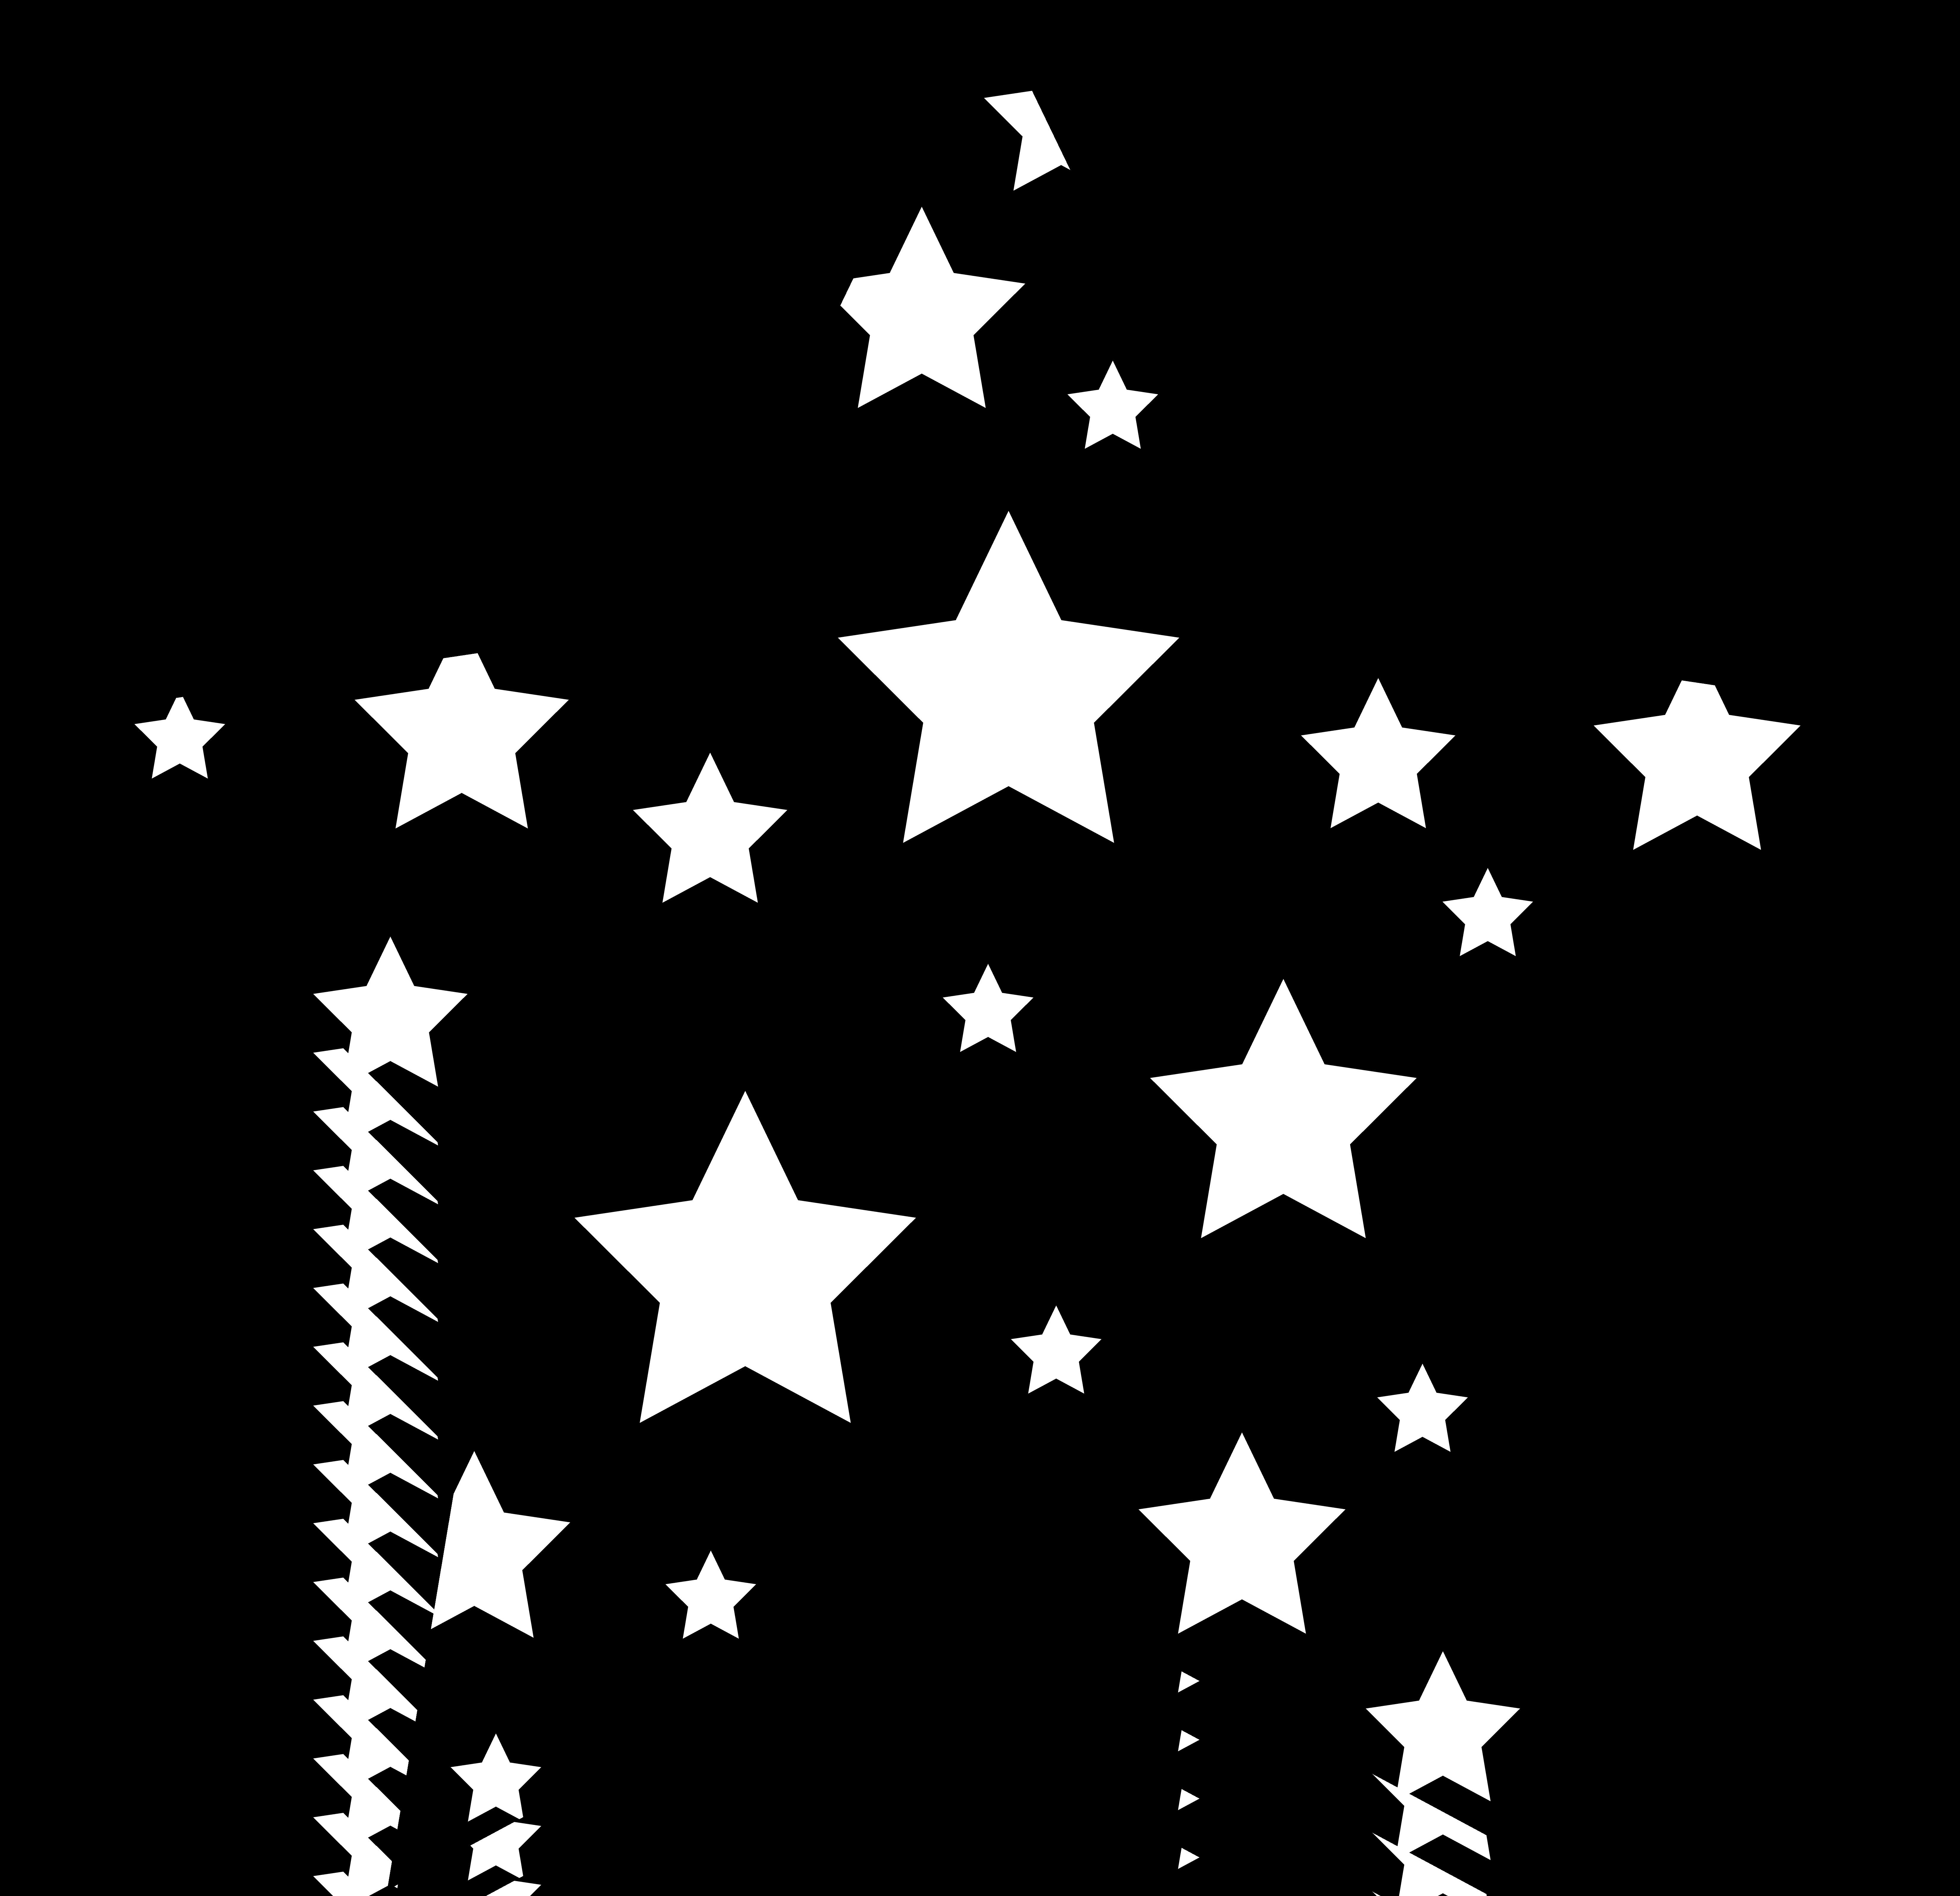 wallpaper star cluster clip art - photo #16